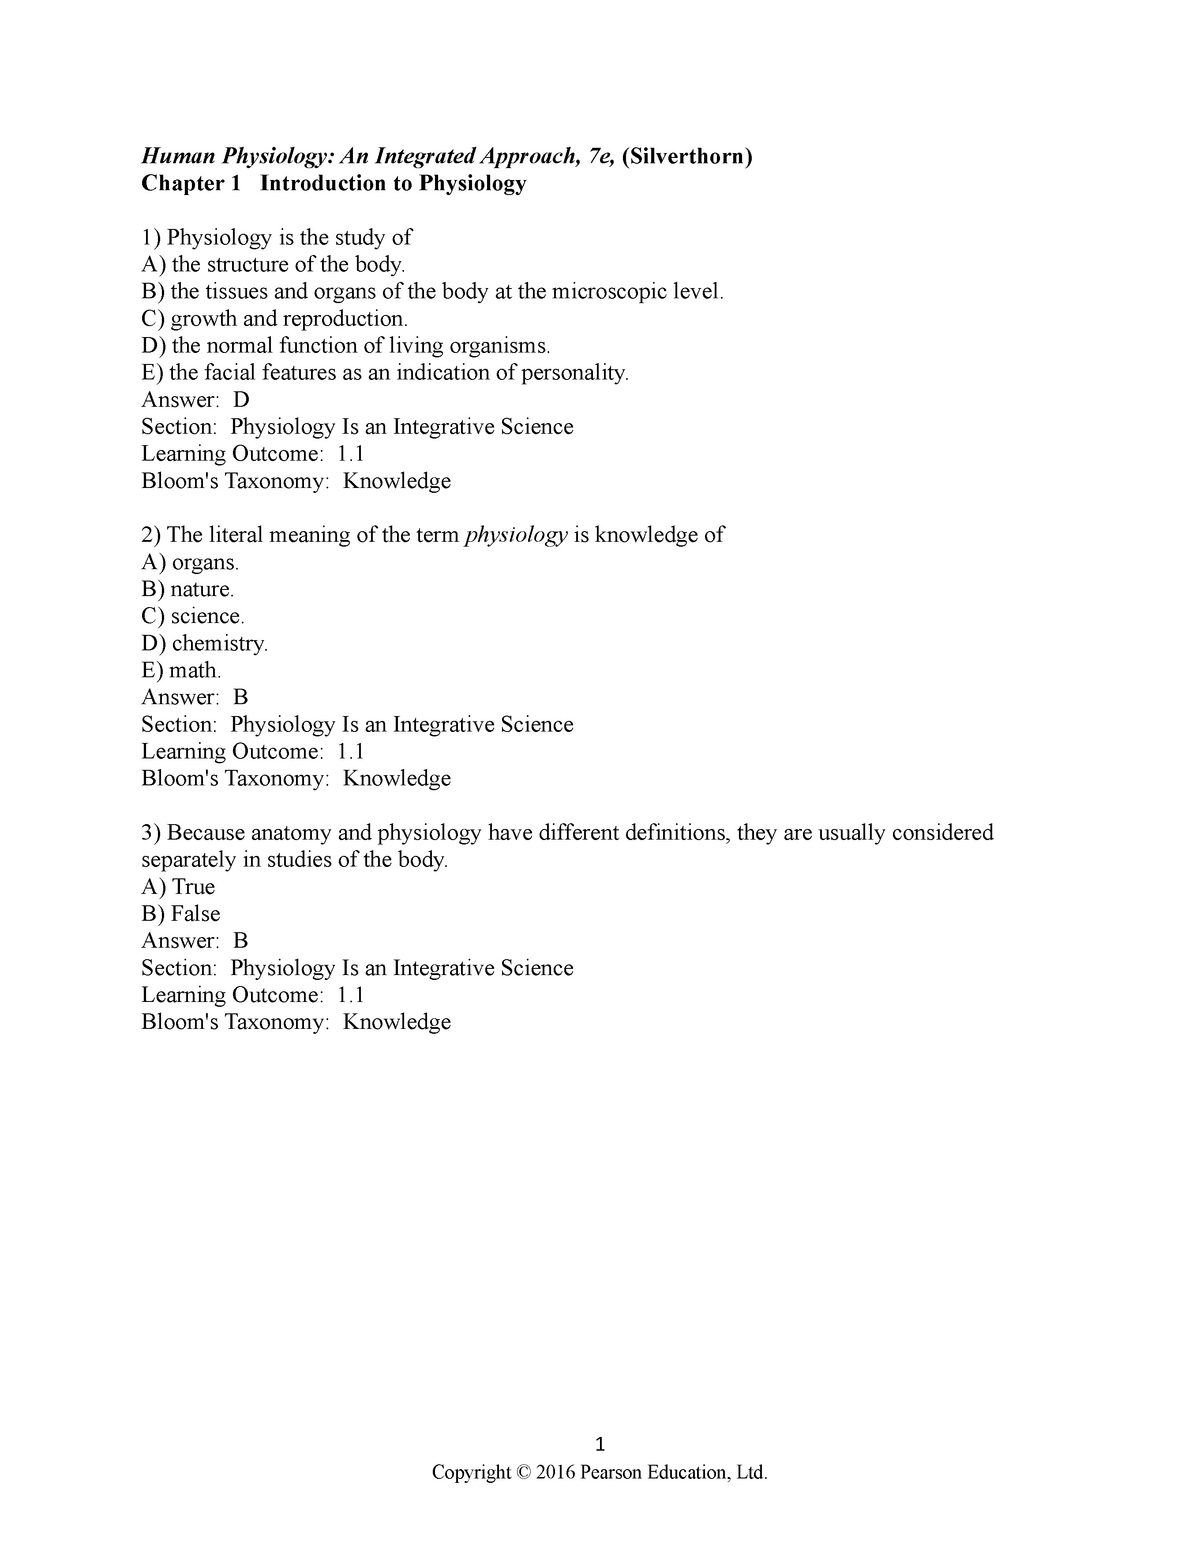 01 test bank - practice questions - BIOL 2410 - U of M - StuDocu